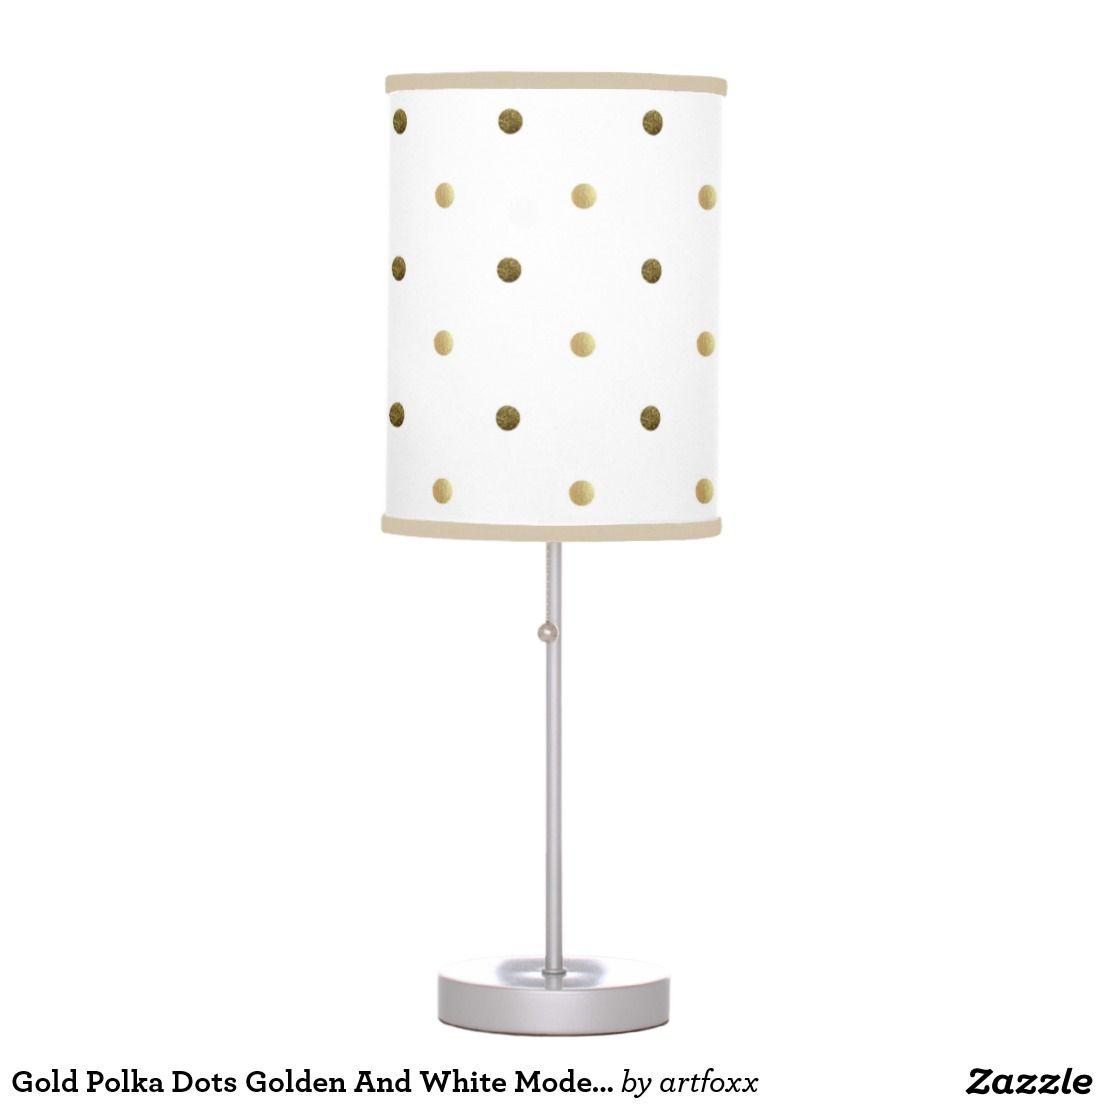 Gold Polka Dots Golden And White Modern Design Table Lamp Zazzle Com Lamp Modern Design Table Design